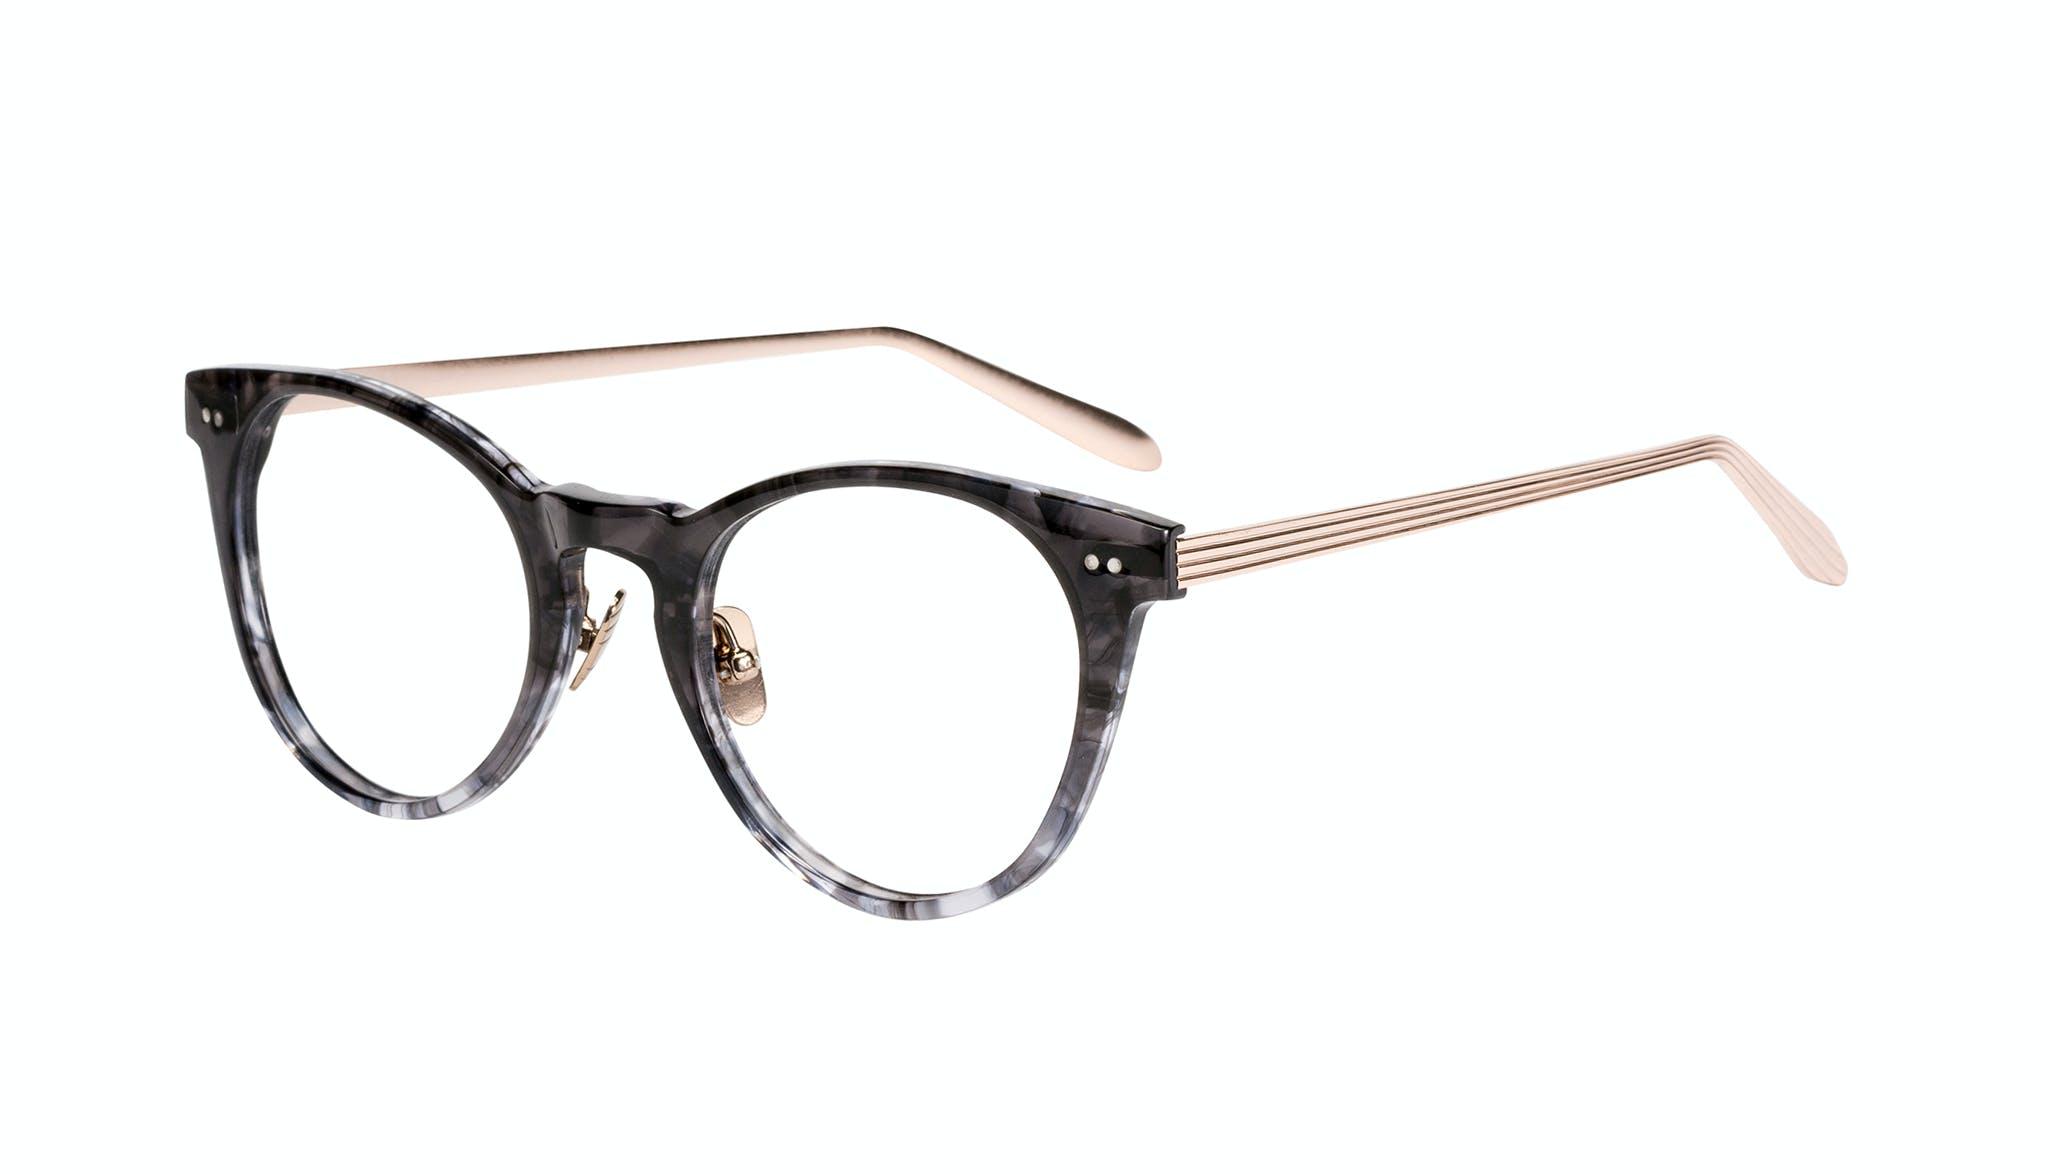 Affordable Fashion Glasses Round Eyeglasses Women Luv Dark Night Tilt